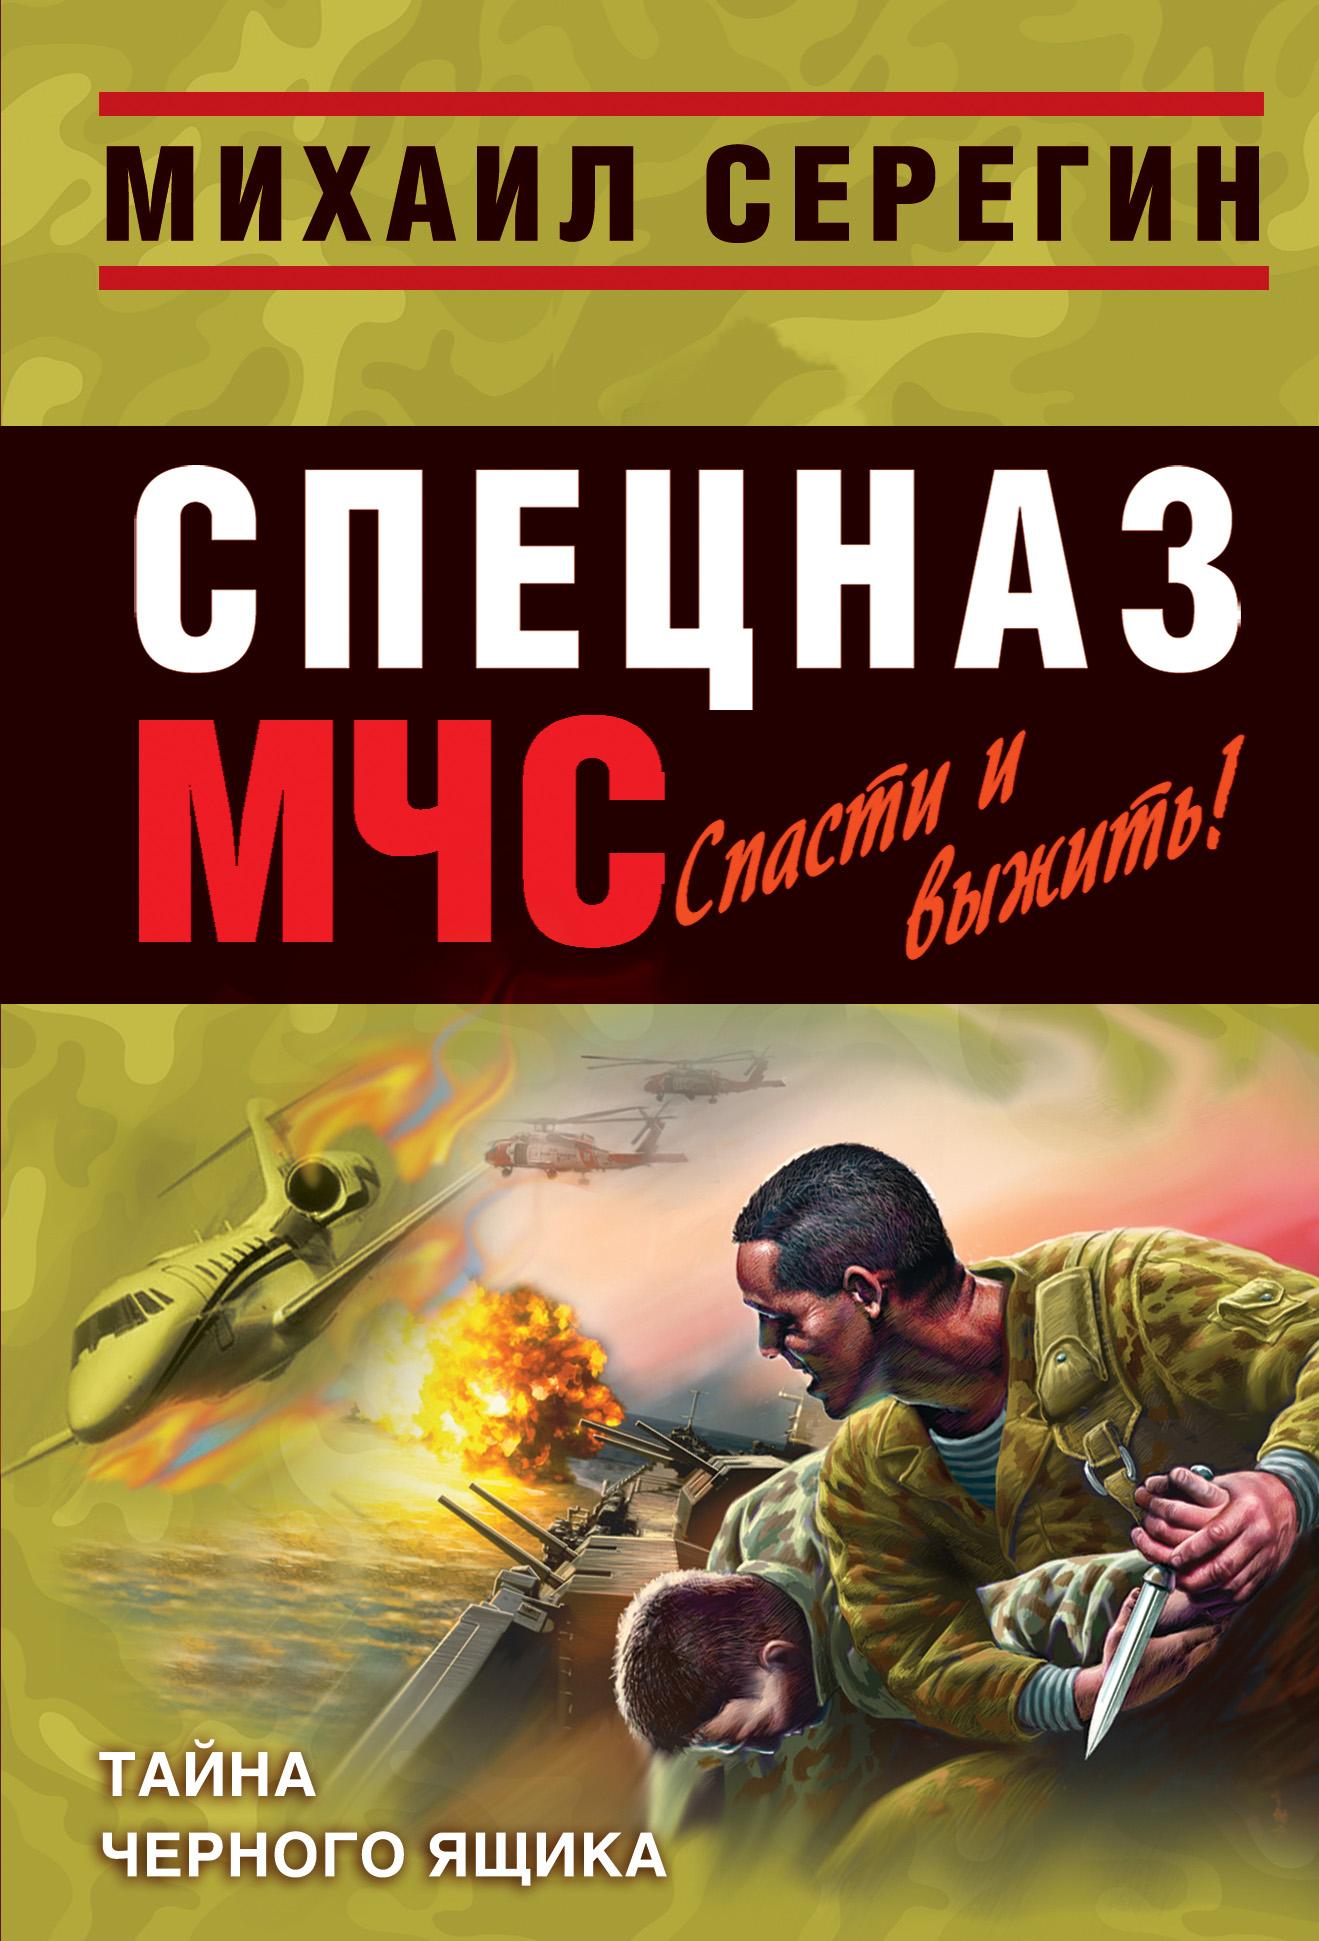 Михаил Серегин Тайна черного ящика 5 pcs bnc male page 3